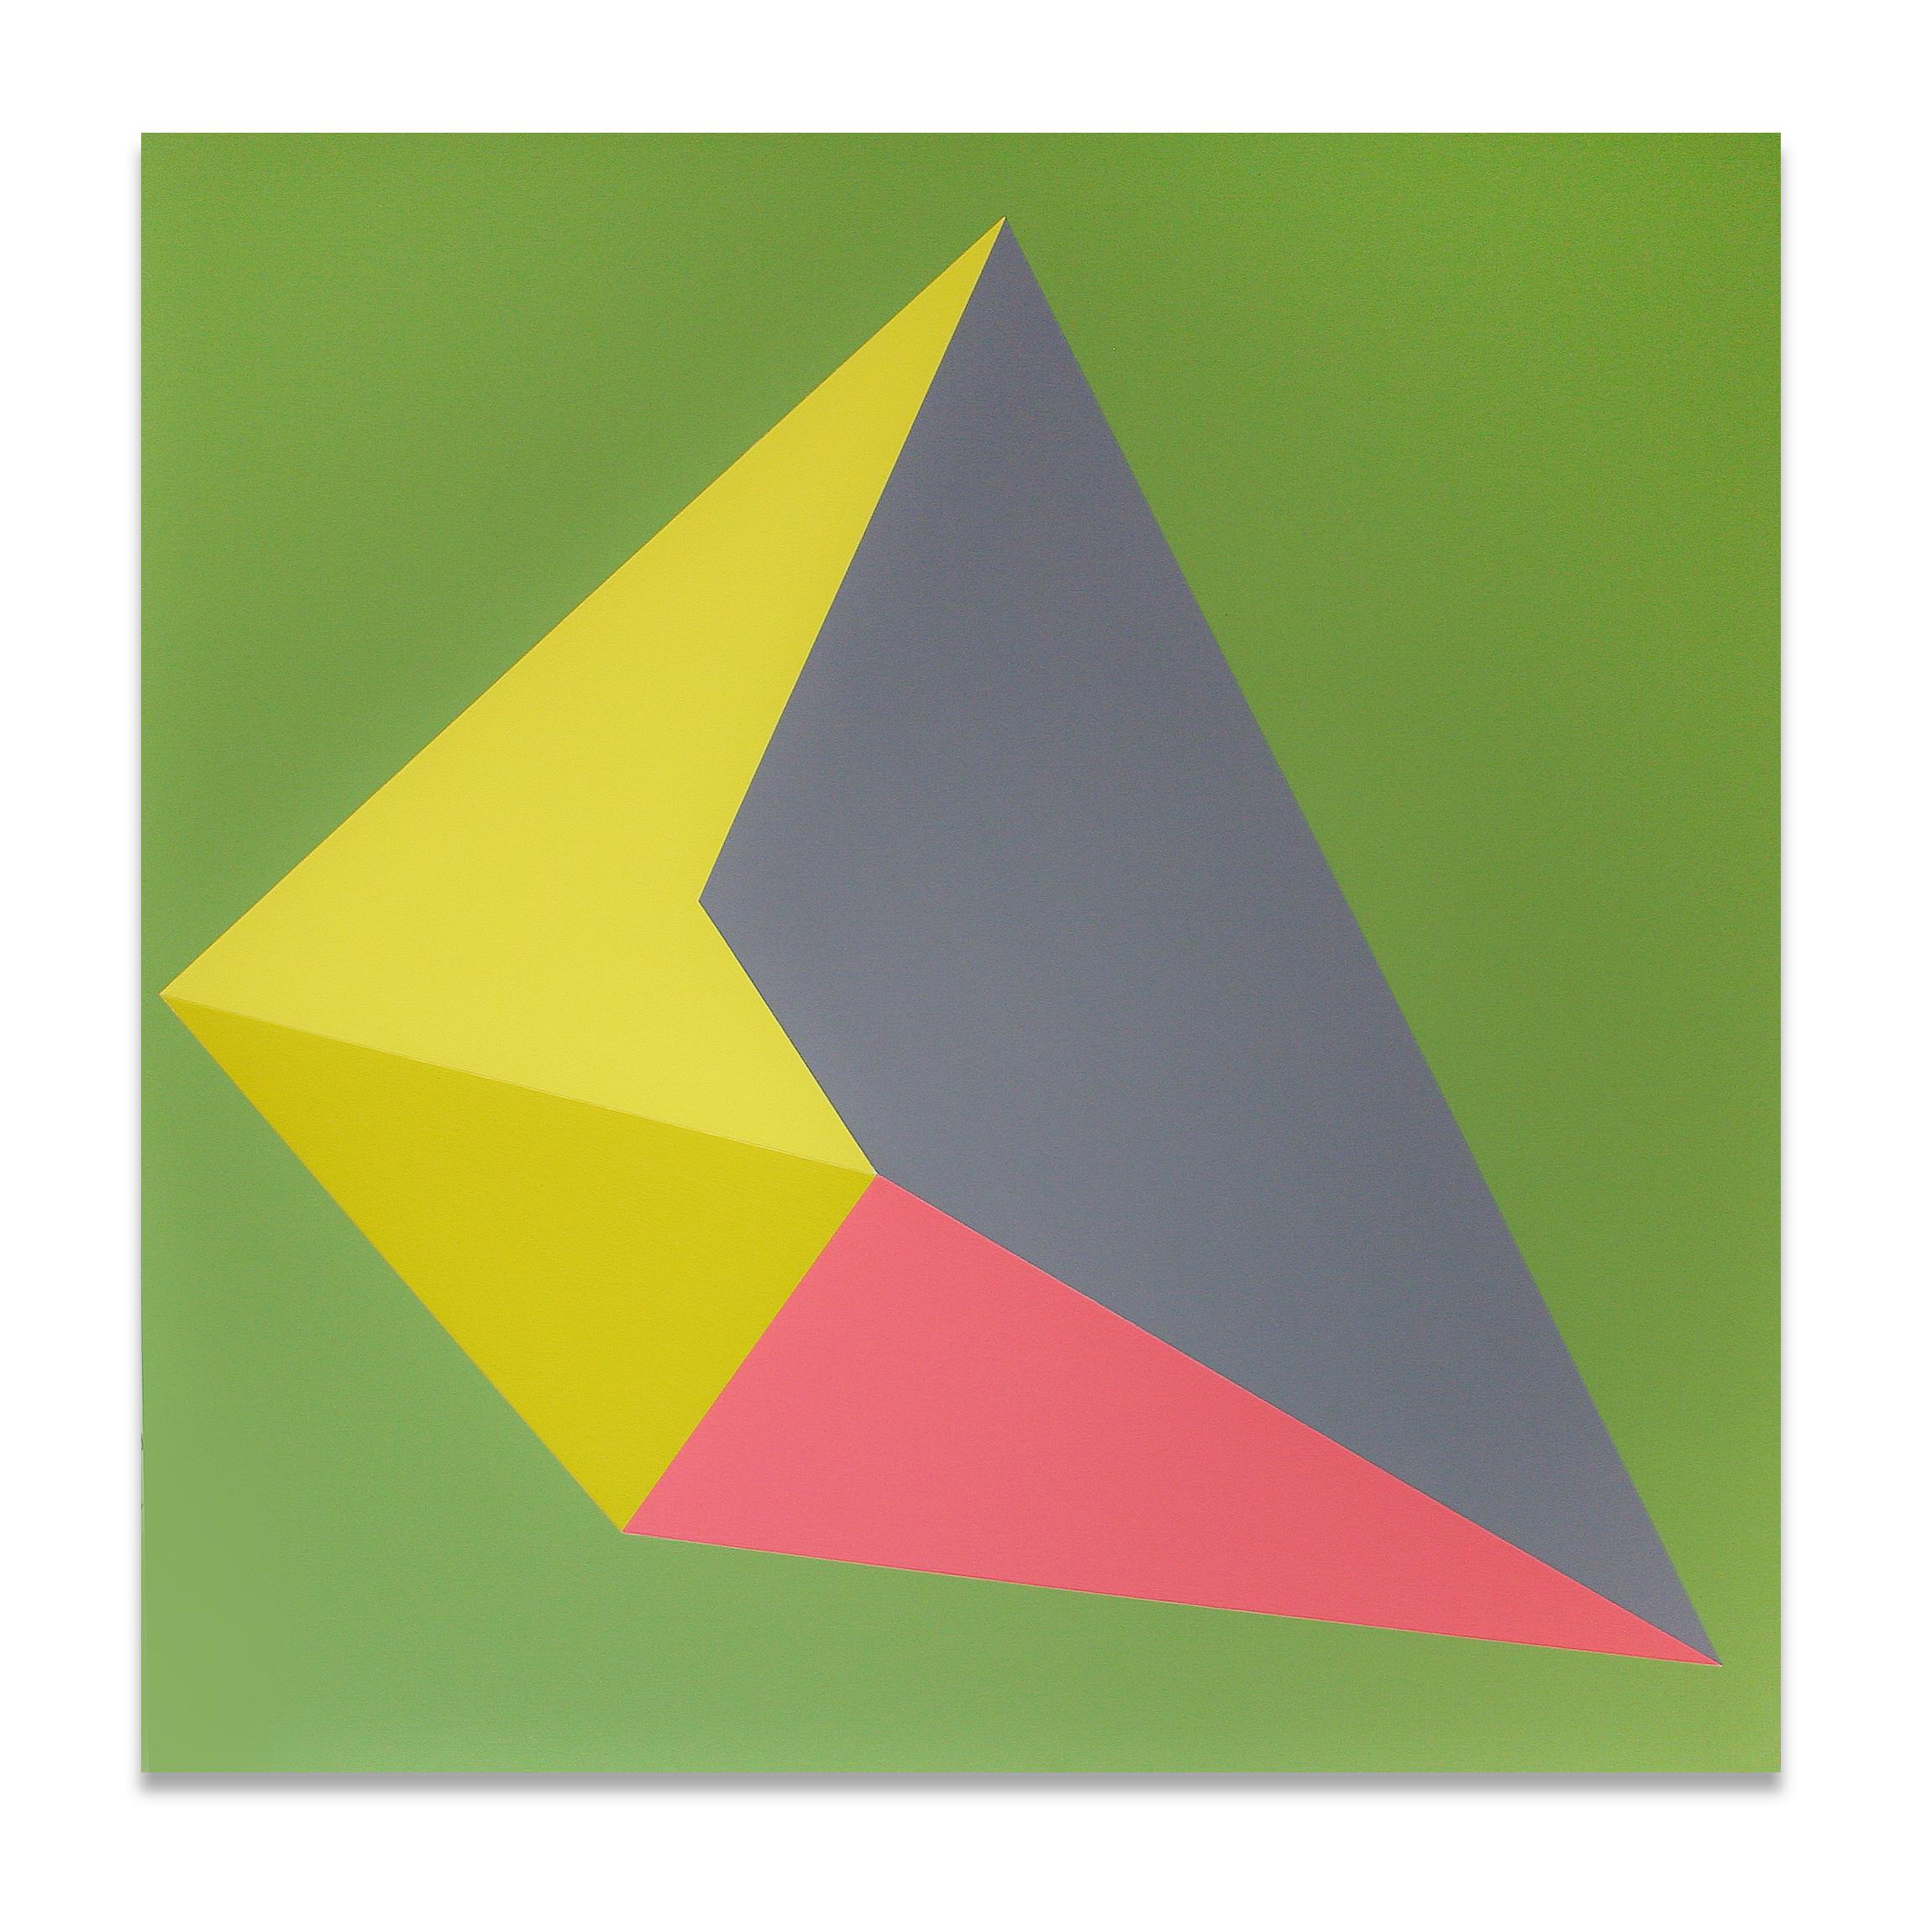 "Picca , 23""x23"", acrylic paint on panel, 2013"